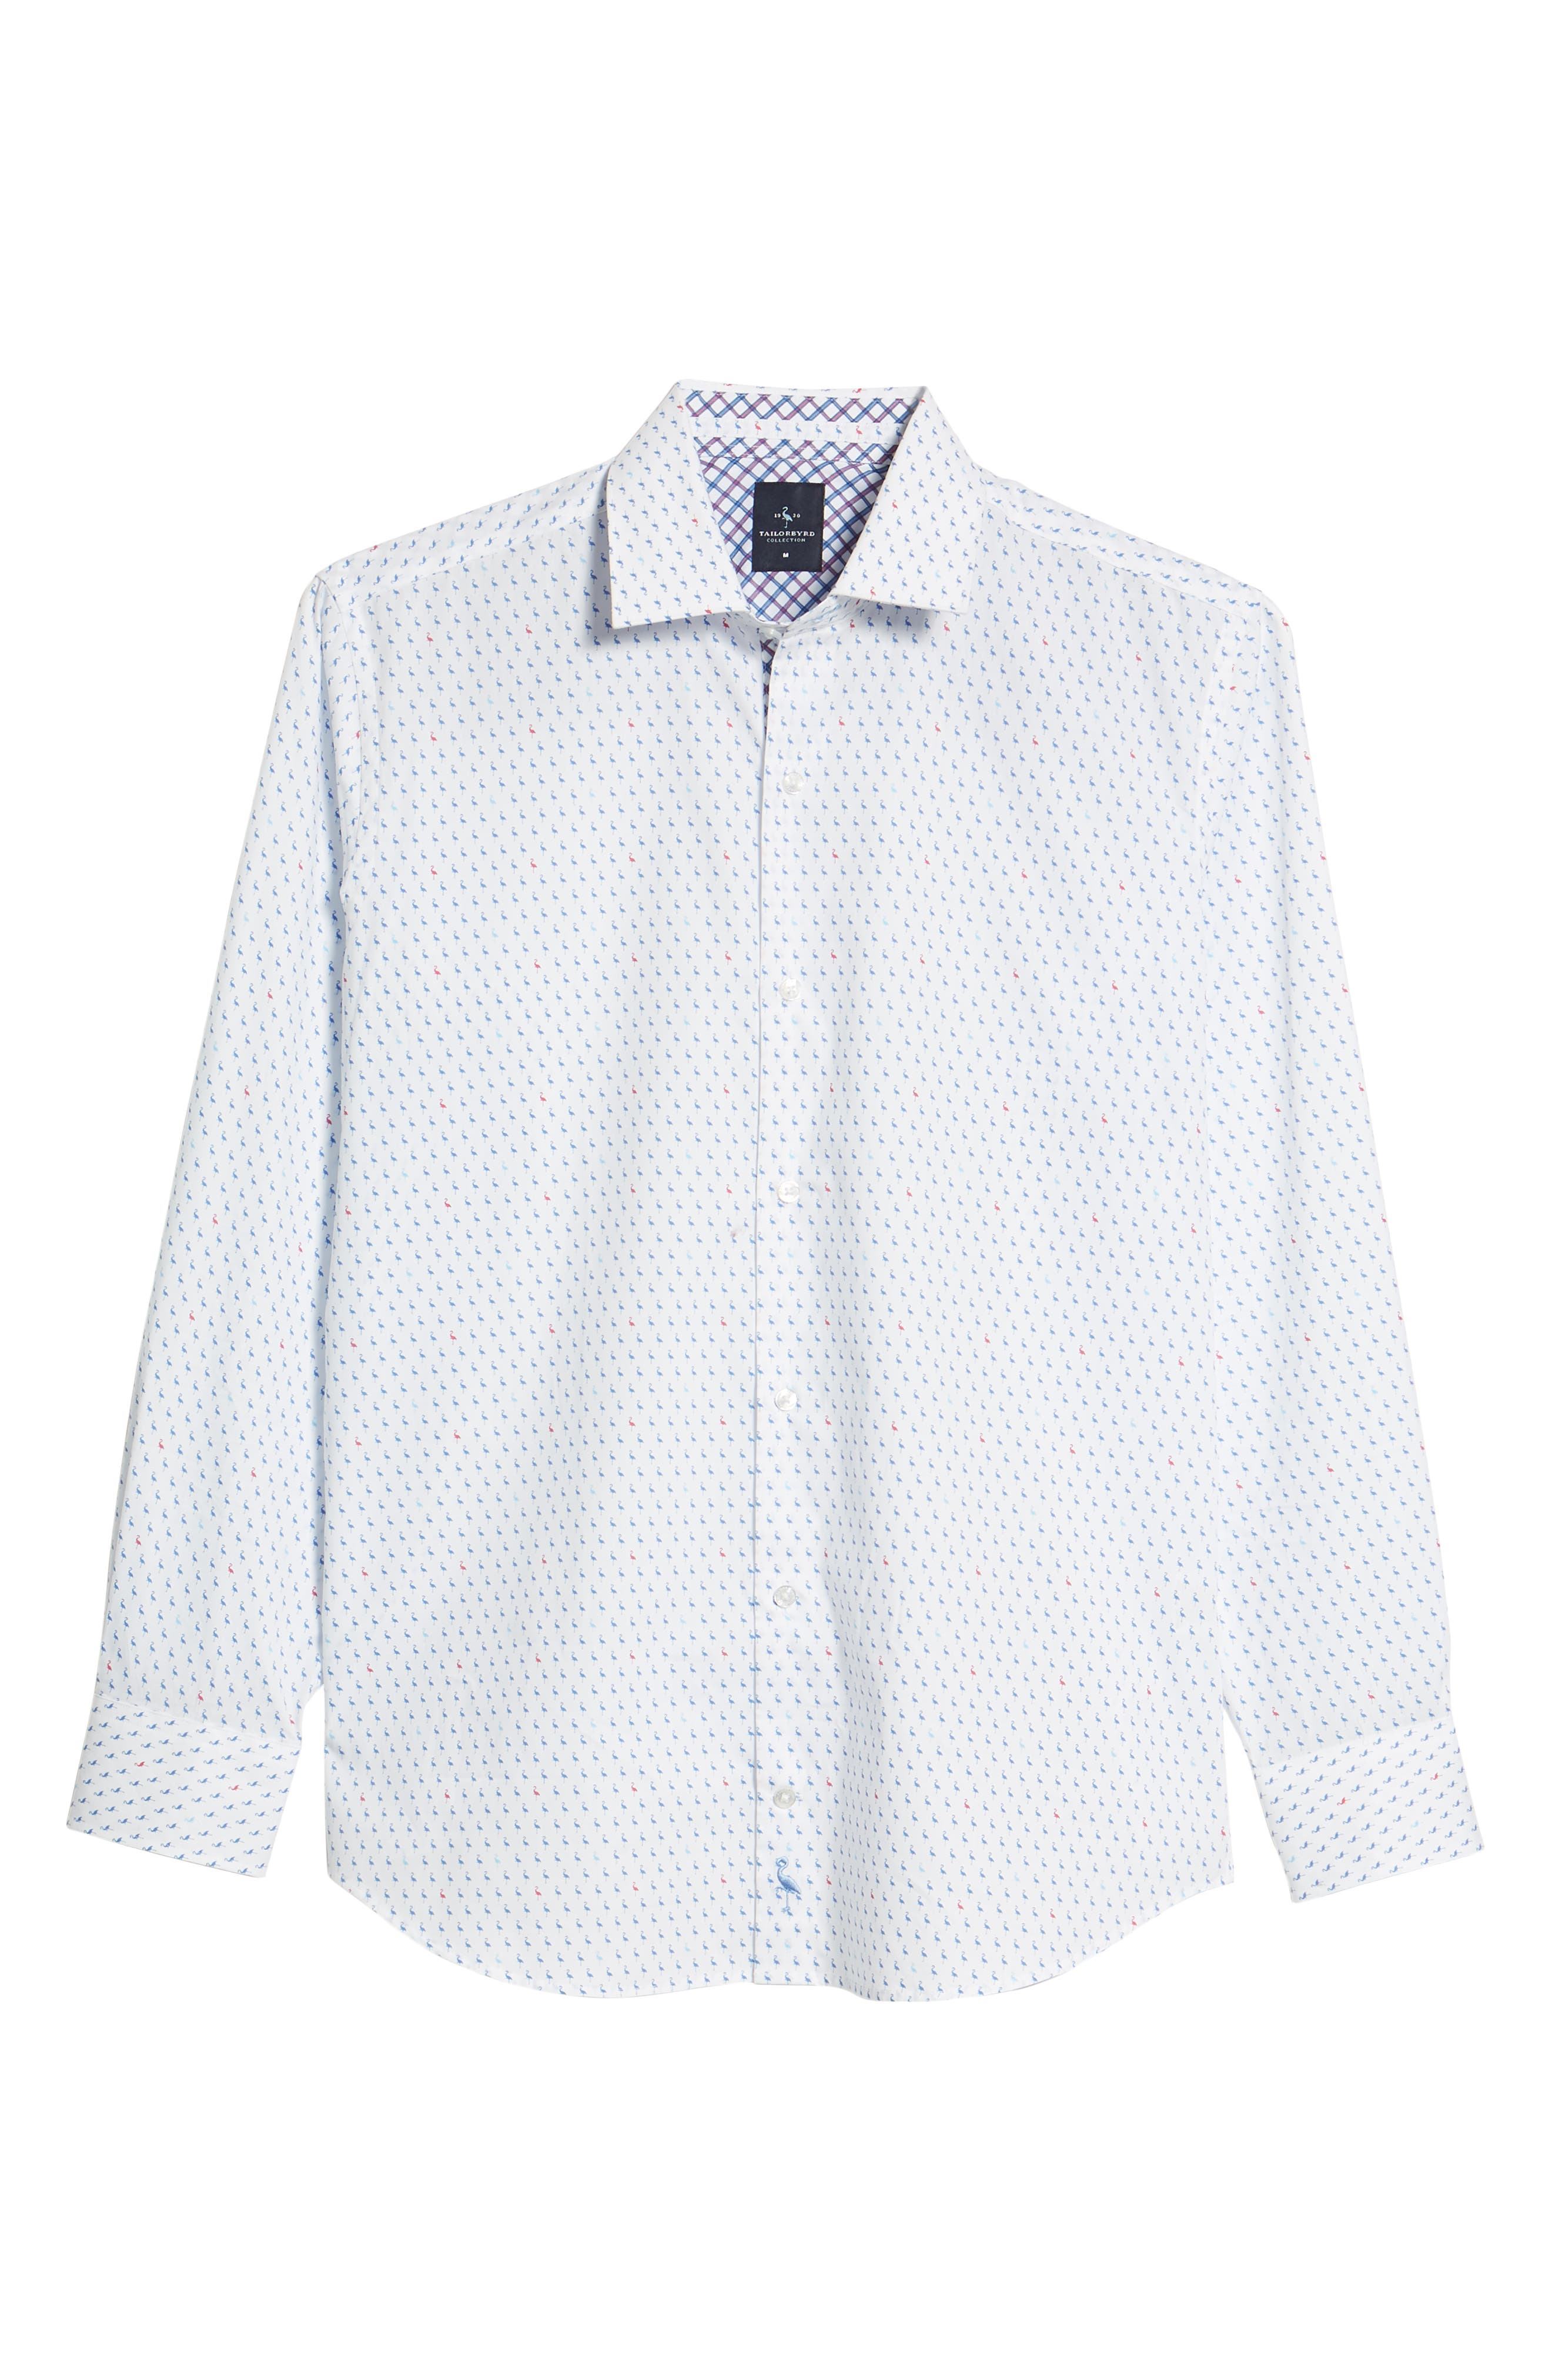 Auden Regular Fit Print Sport Shirt,                             Alternate thumbnail 6, color,                             Peri Blue